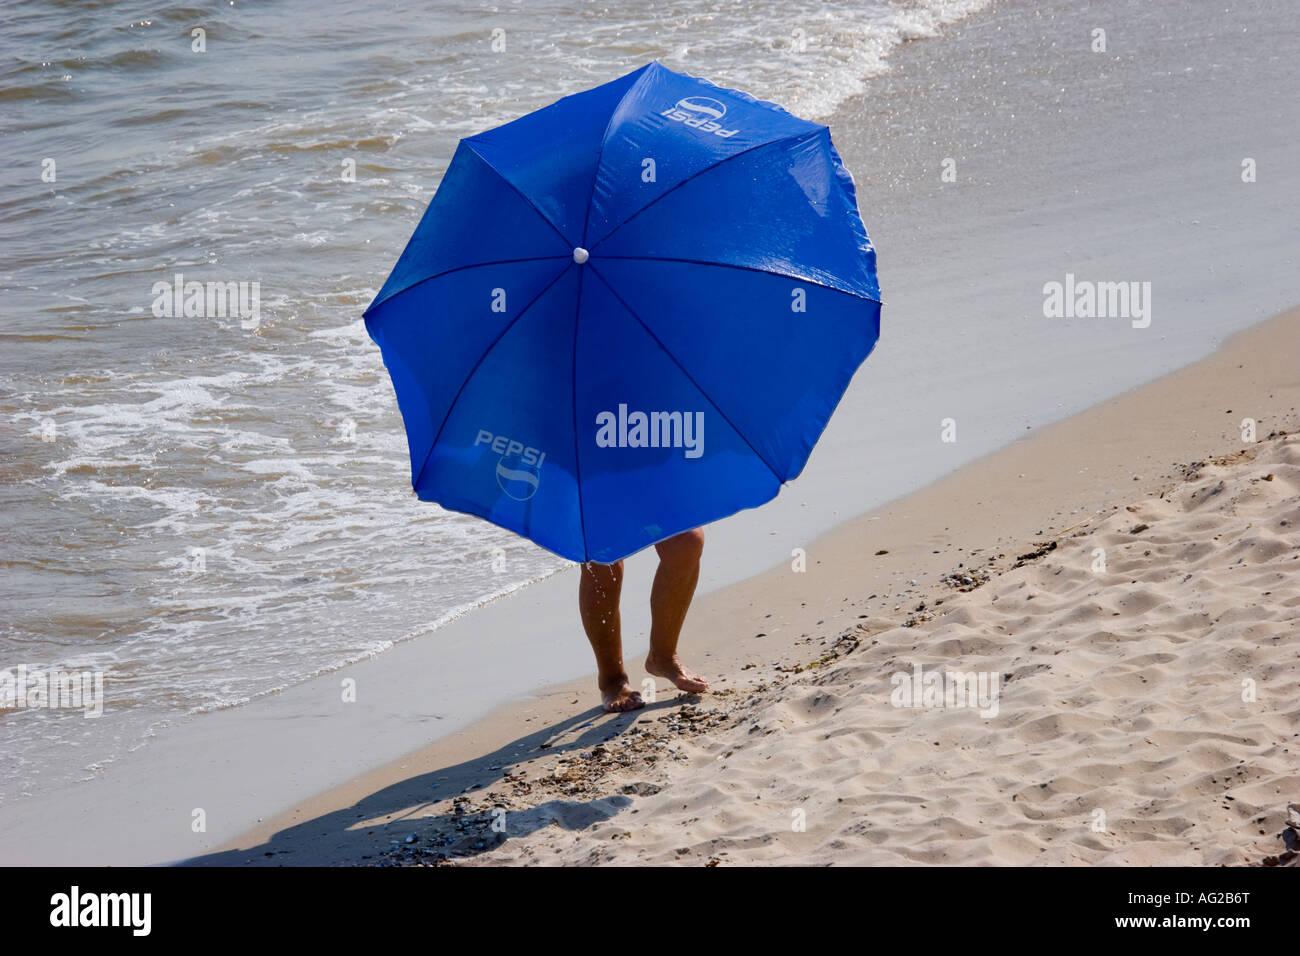 A sun umbrella seems to be walking at the Black Sea beach of Lebedivka / Ukraine - Stock Image